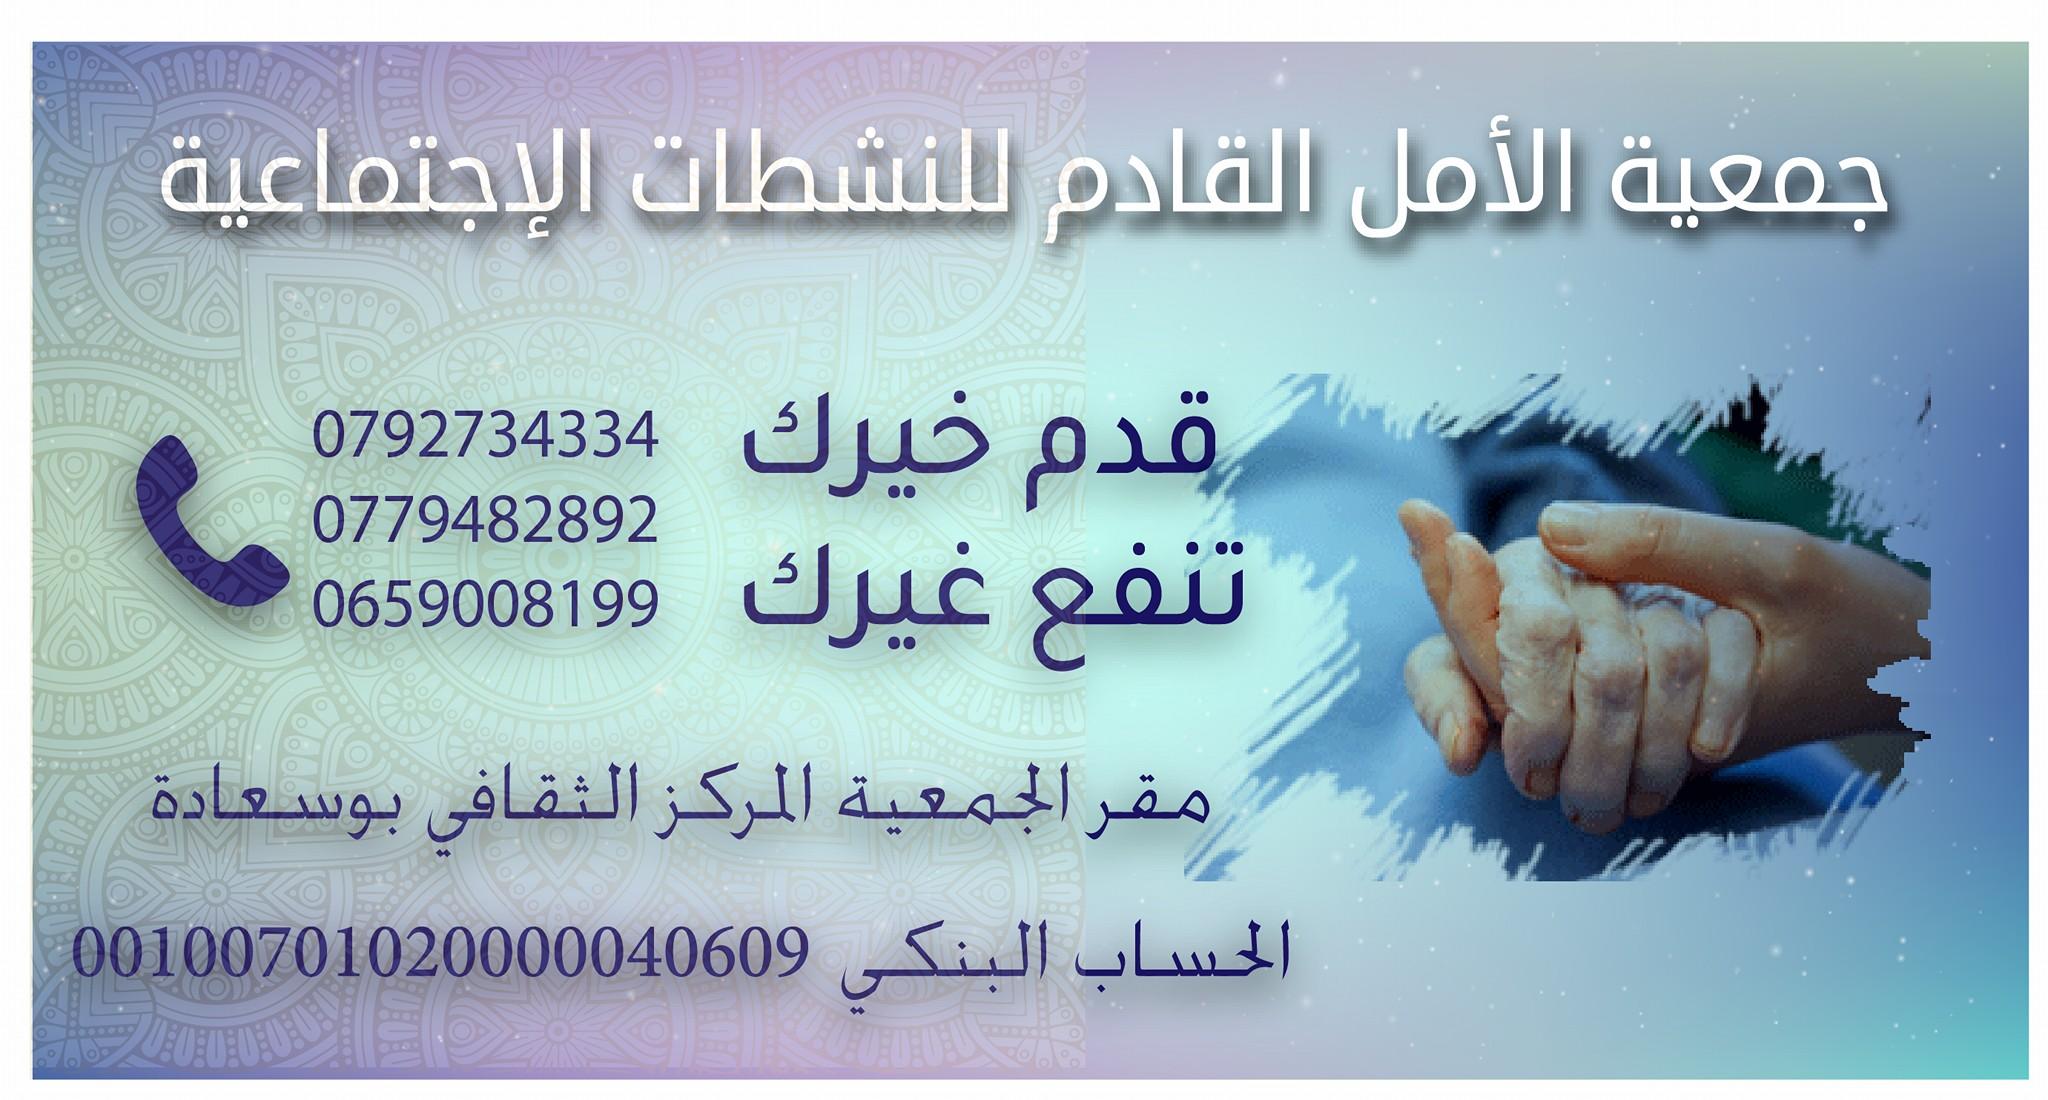 493d59352d726 Petites annonces gratuites algériennes جمعية الأمل القادم في بوسعادة